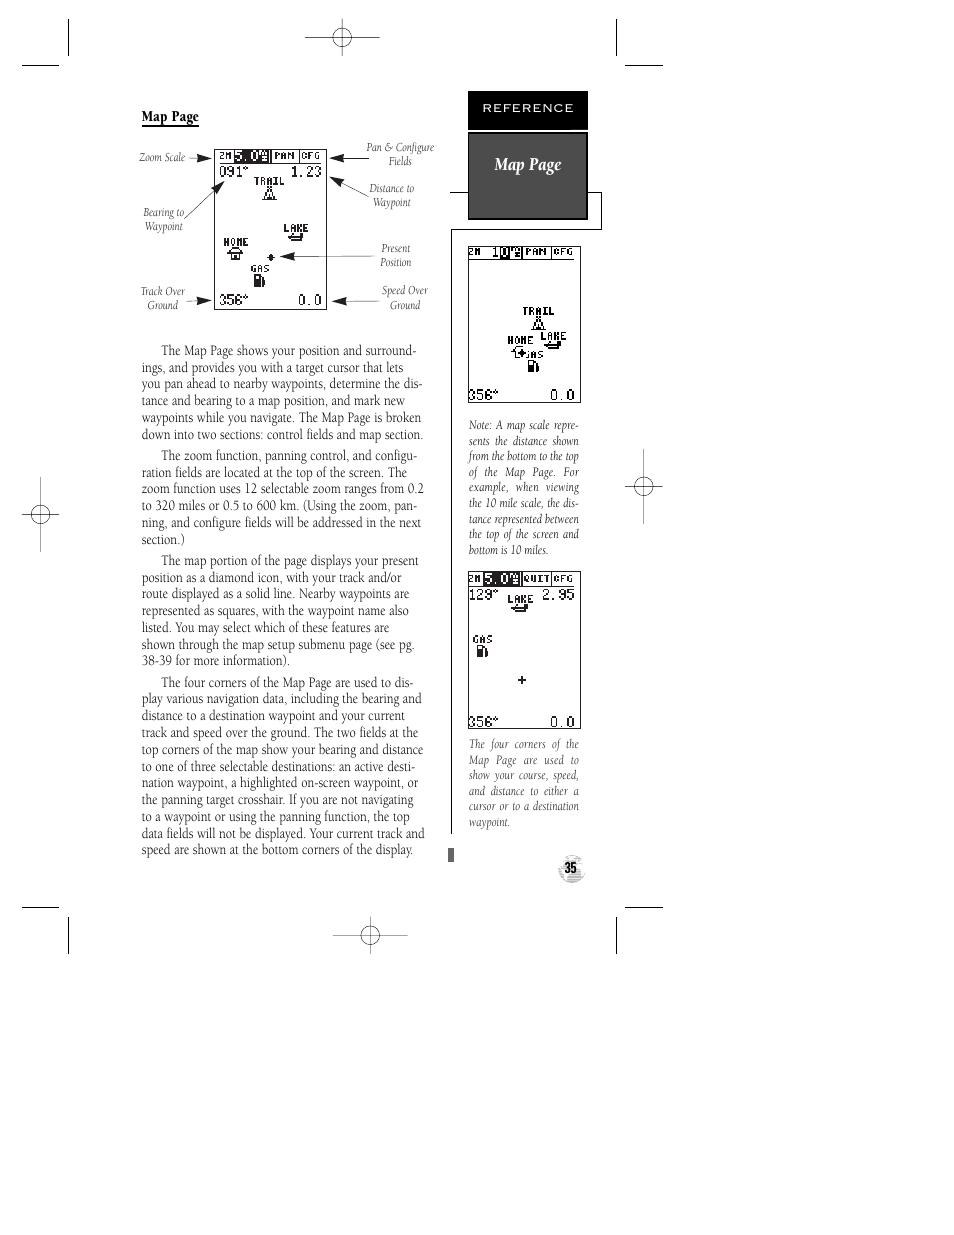 map page garmin gps 12xl user manual page 39 64 original mode rh manualsdir com garmin gps 12xl manual.pdf garmin gps 12 xl owners manual